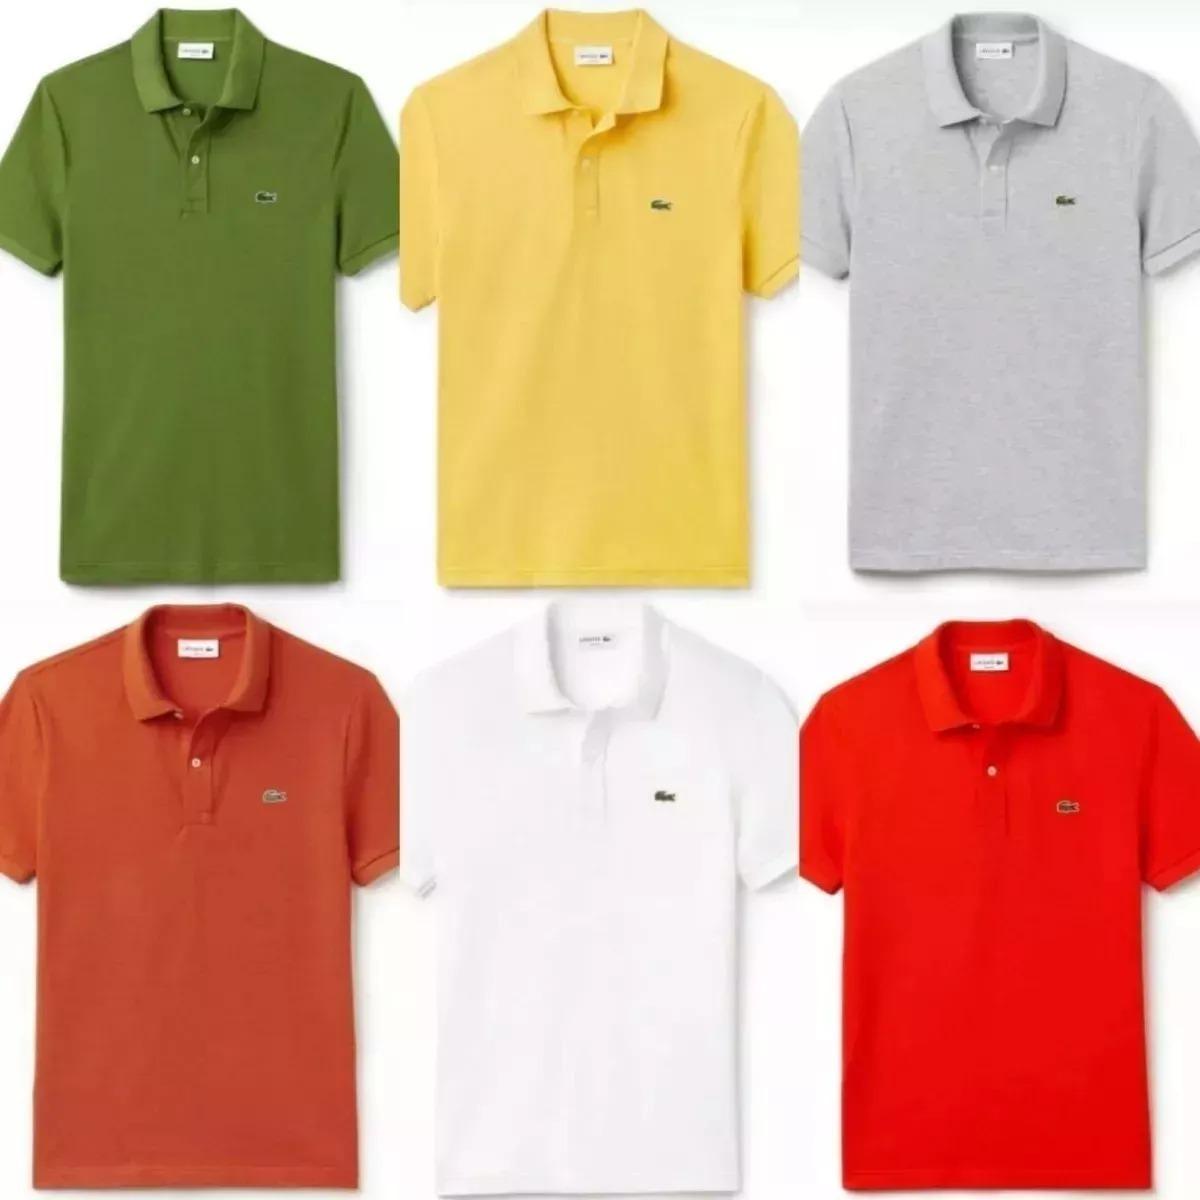 c06cbe1028 kit c 10 camisas polo camisetas masculinas top luxo. Carregando zoom.